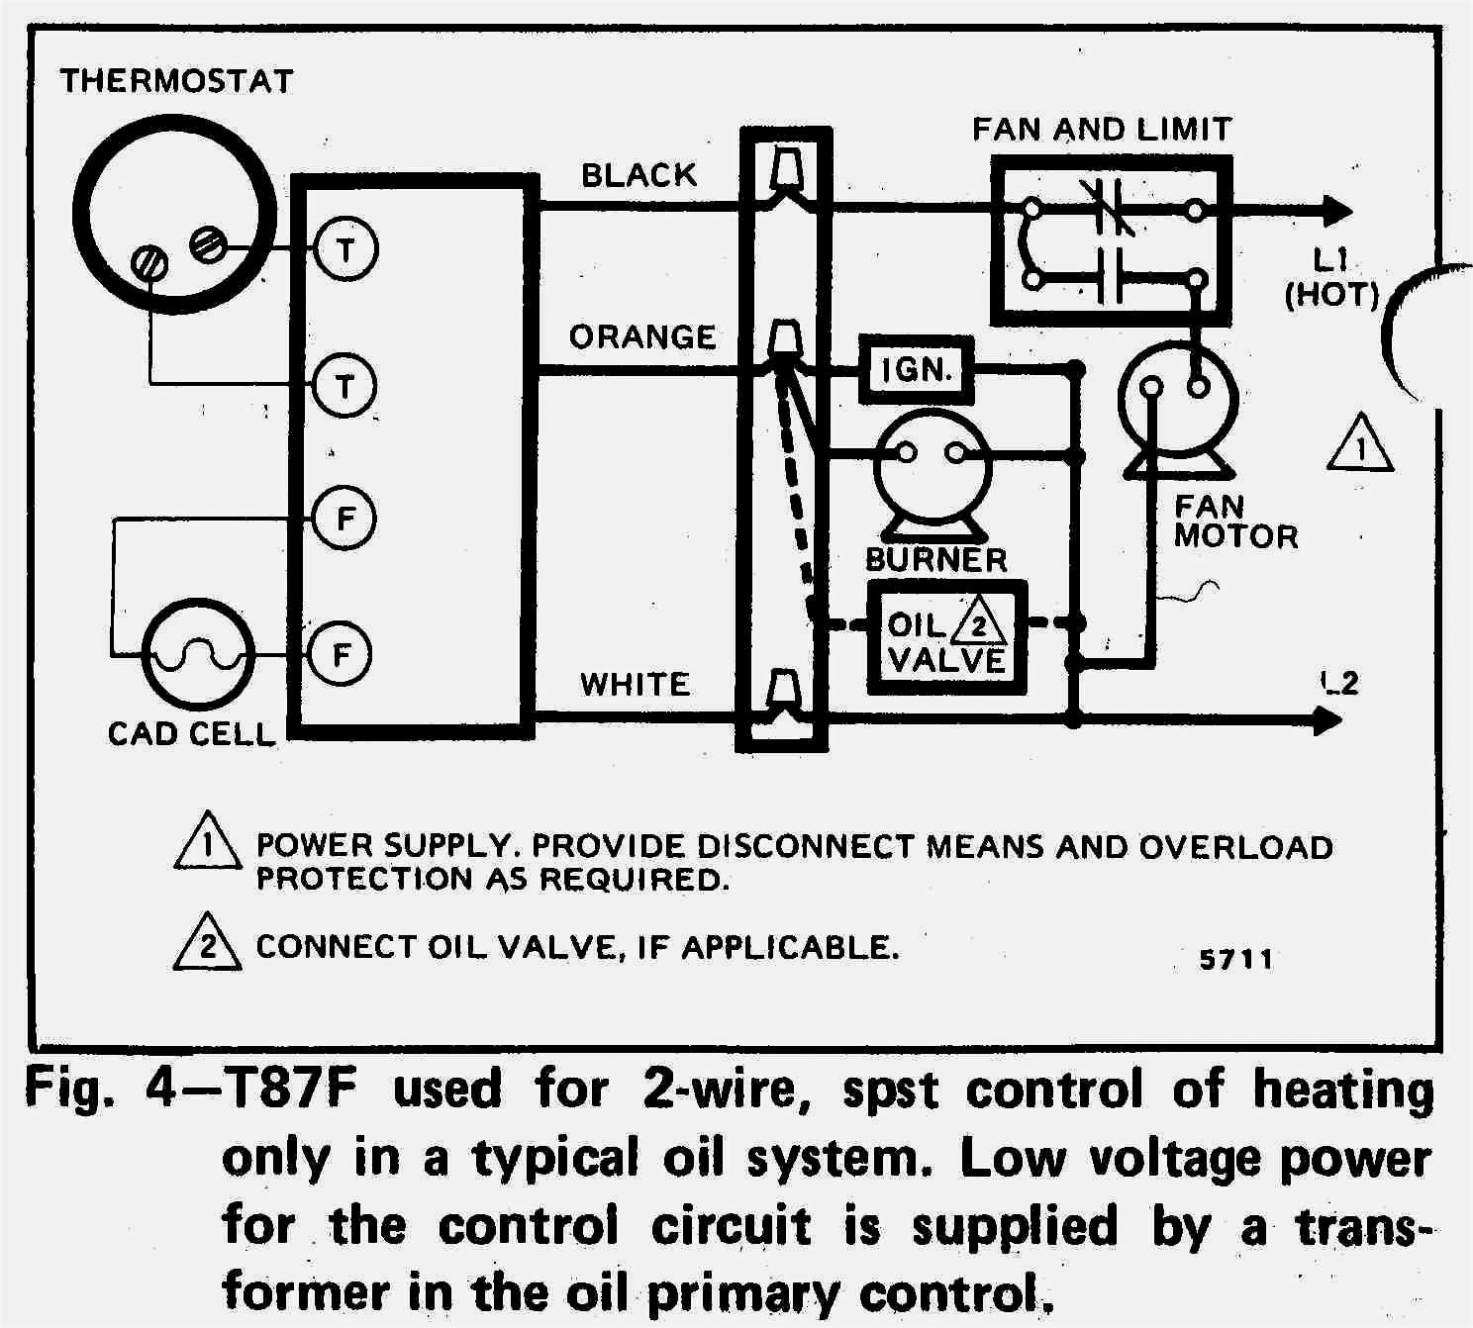 Signal Stat 900 Wiring Diagram – Signal Stat 900 Wiring Diagram - Signal Stat 900 Wiring Diagram